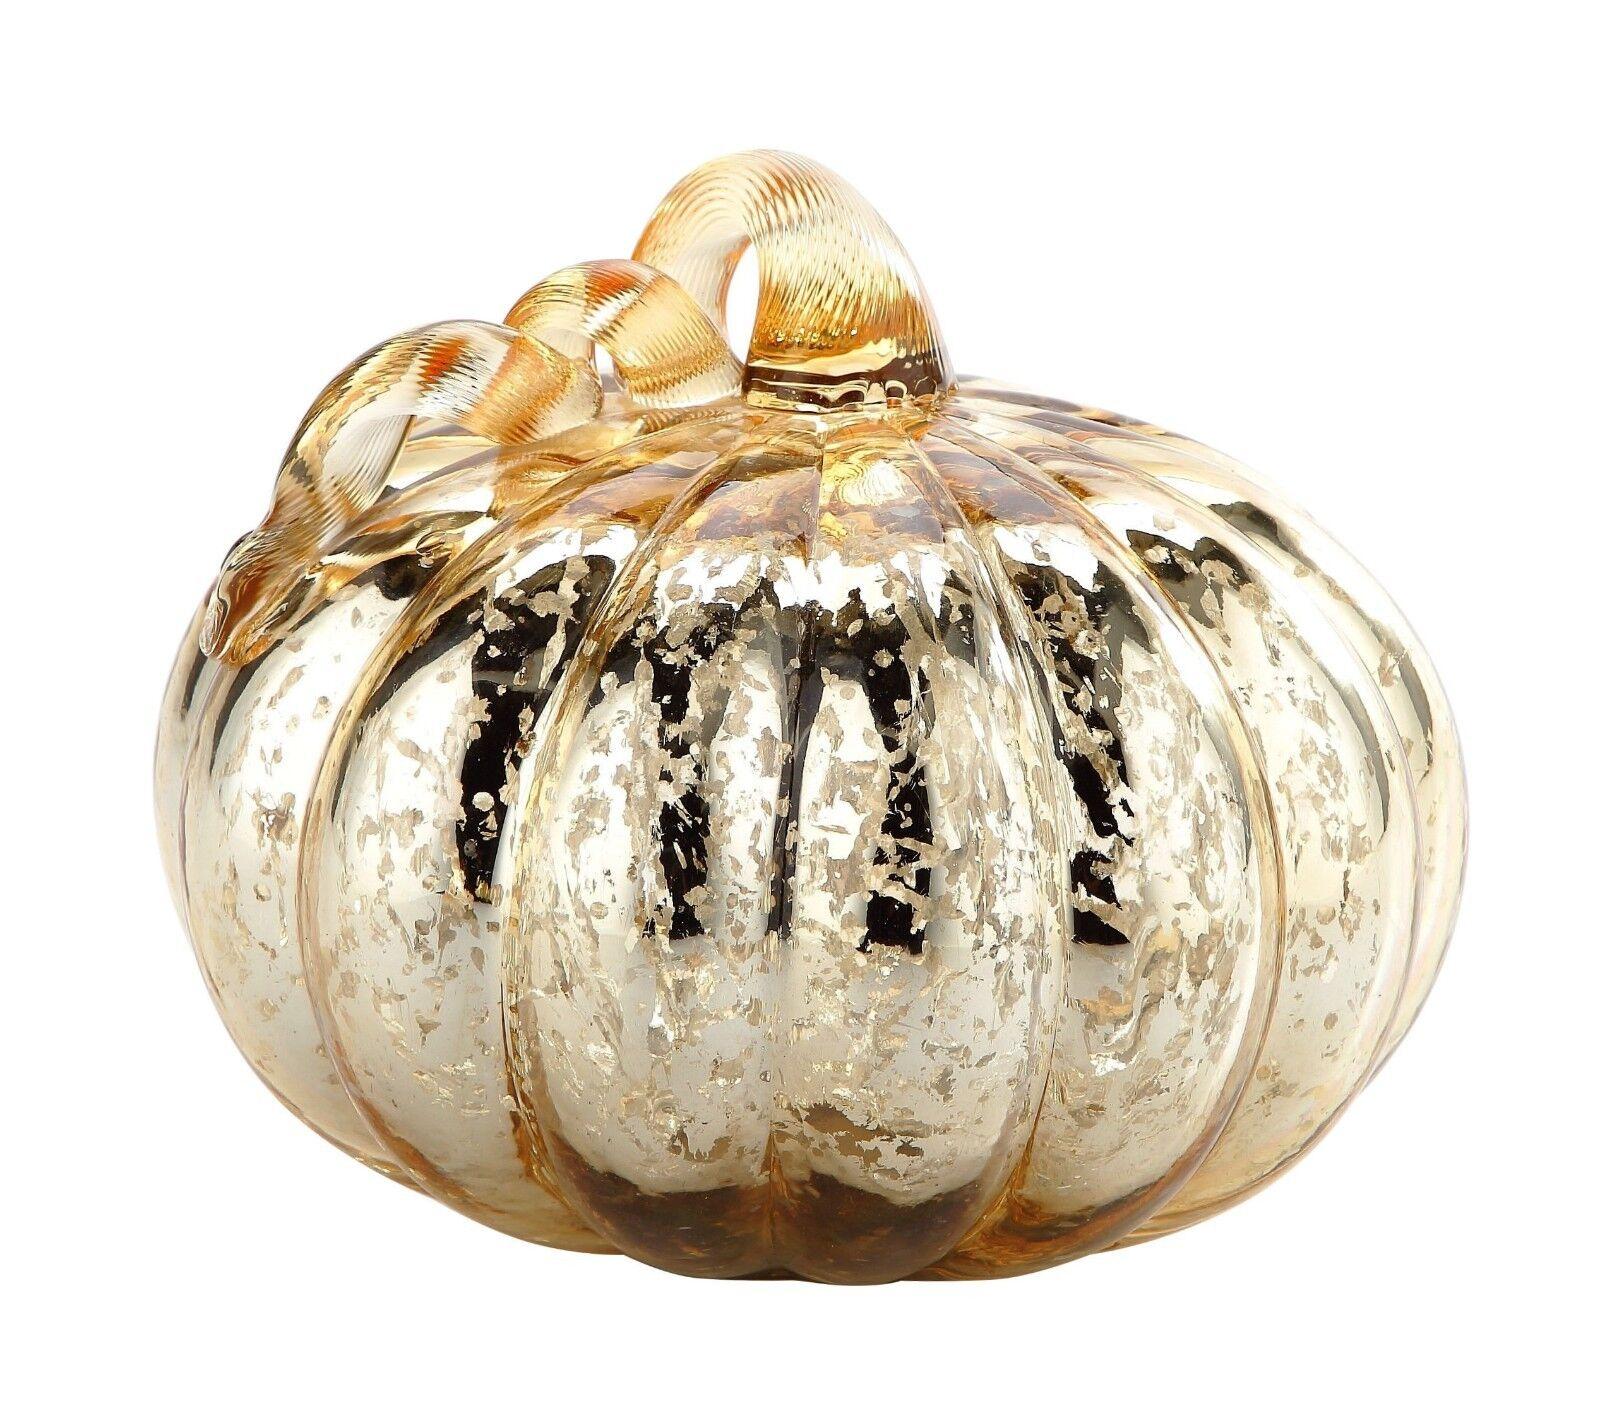 New 9  Hand Blown Art Glass Mercury Mercury Mercury Gold Pumpkin Sculpture Figurine Fall Harvest c4d464